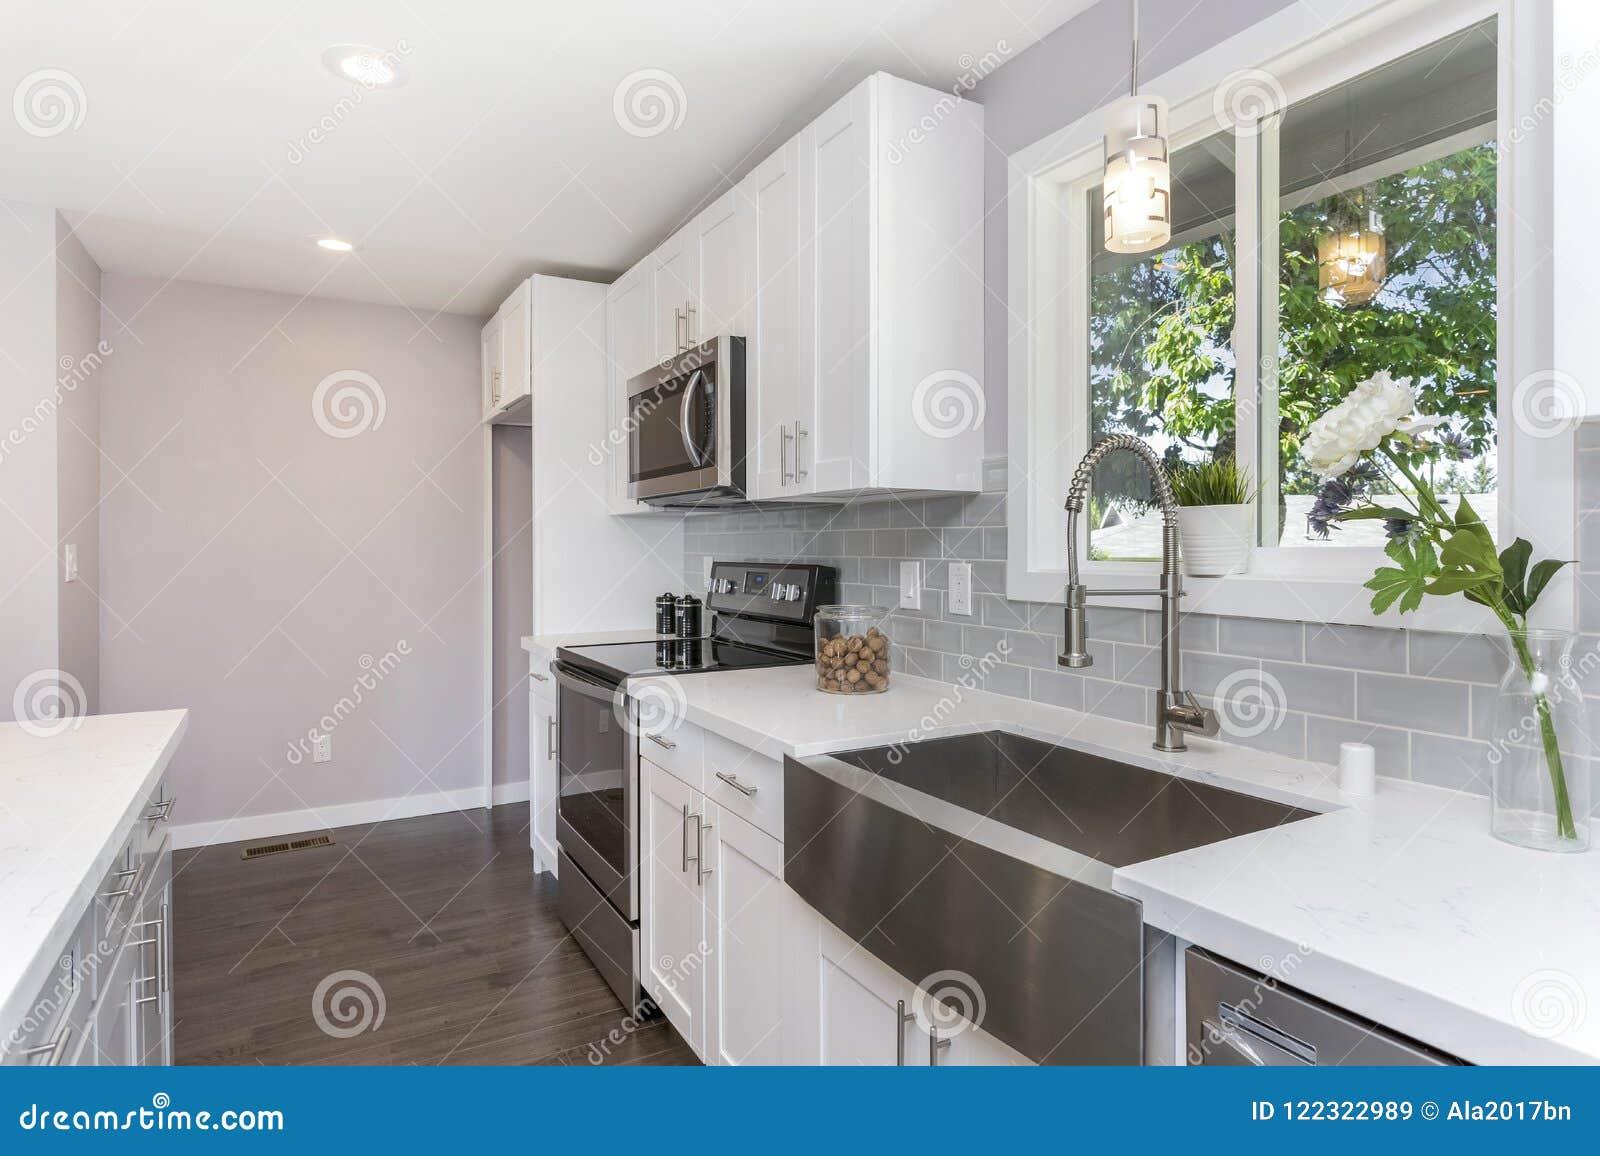 Gorgeous kitchen with a farm sink.